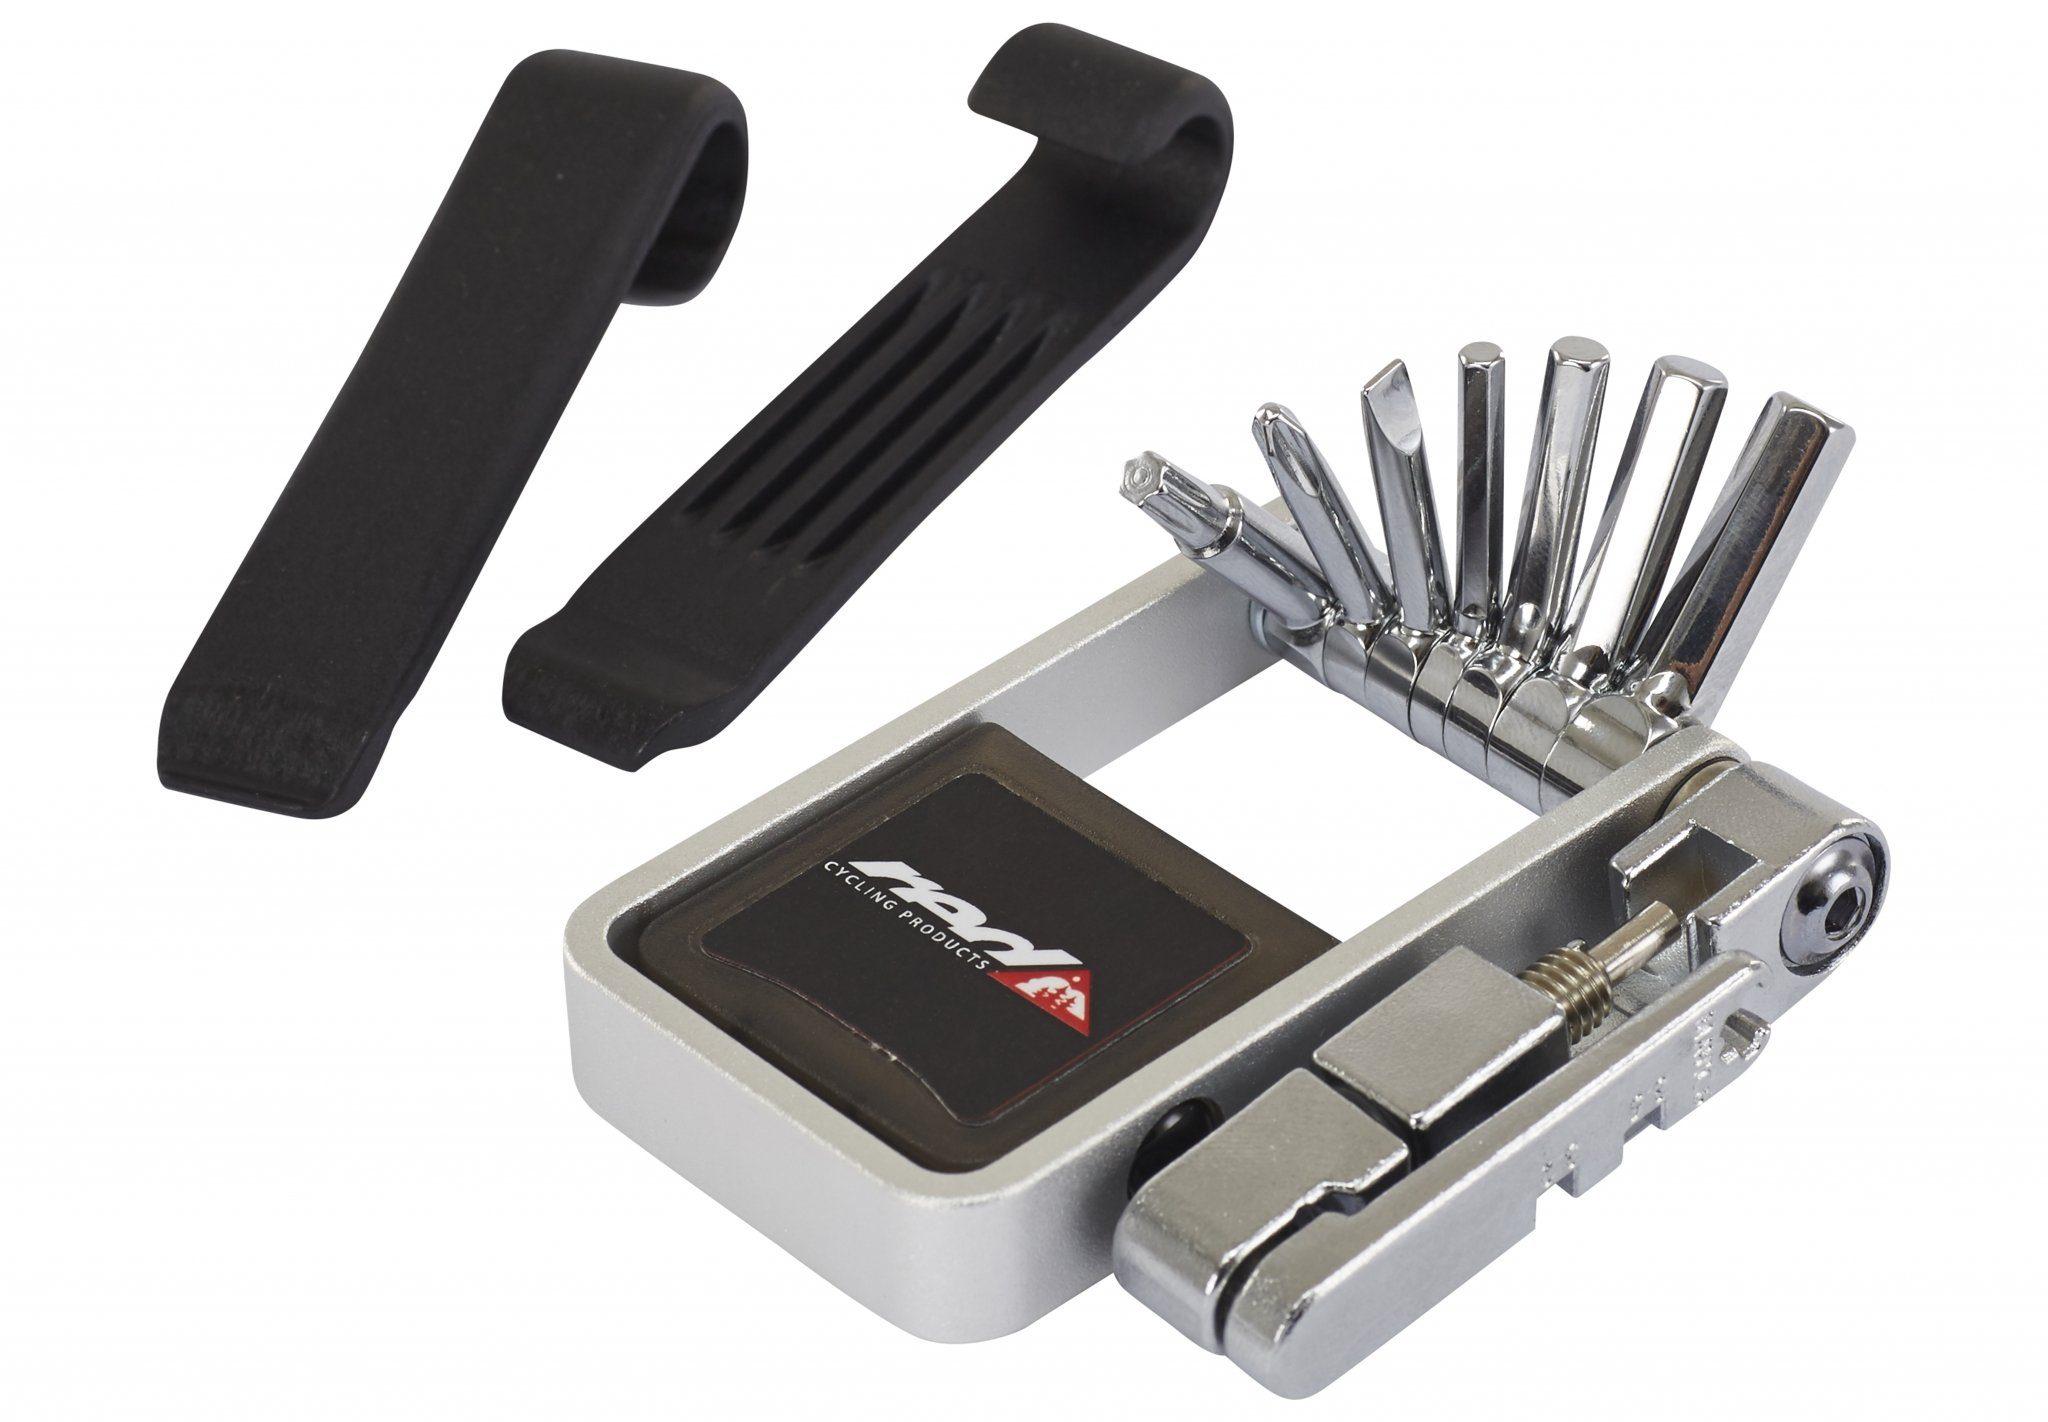 Red Cycling Products Werkzeug & Montage »PRO Tool 14 in 1 Miniwerkzeug«